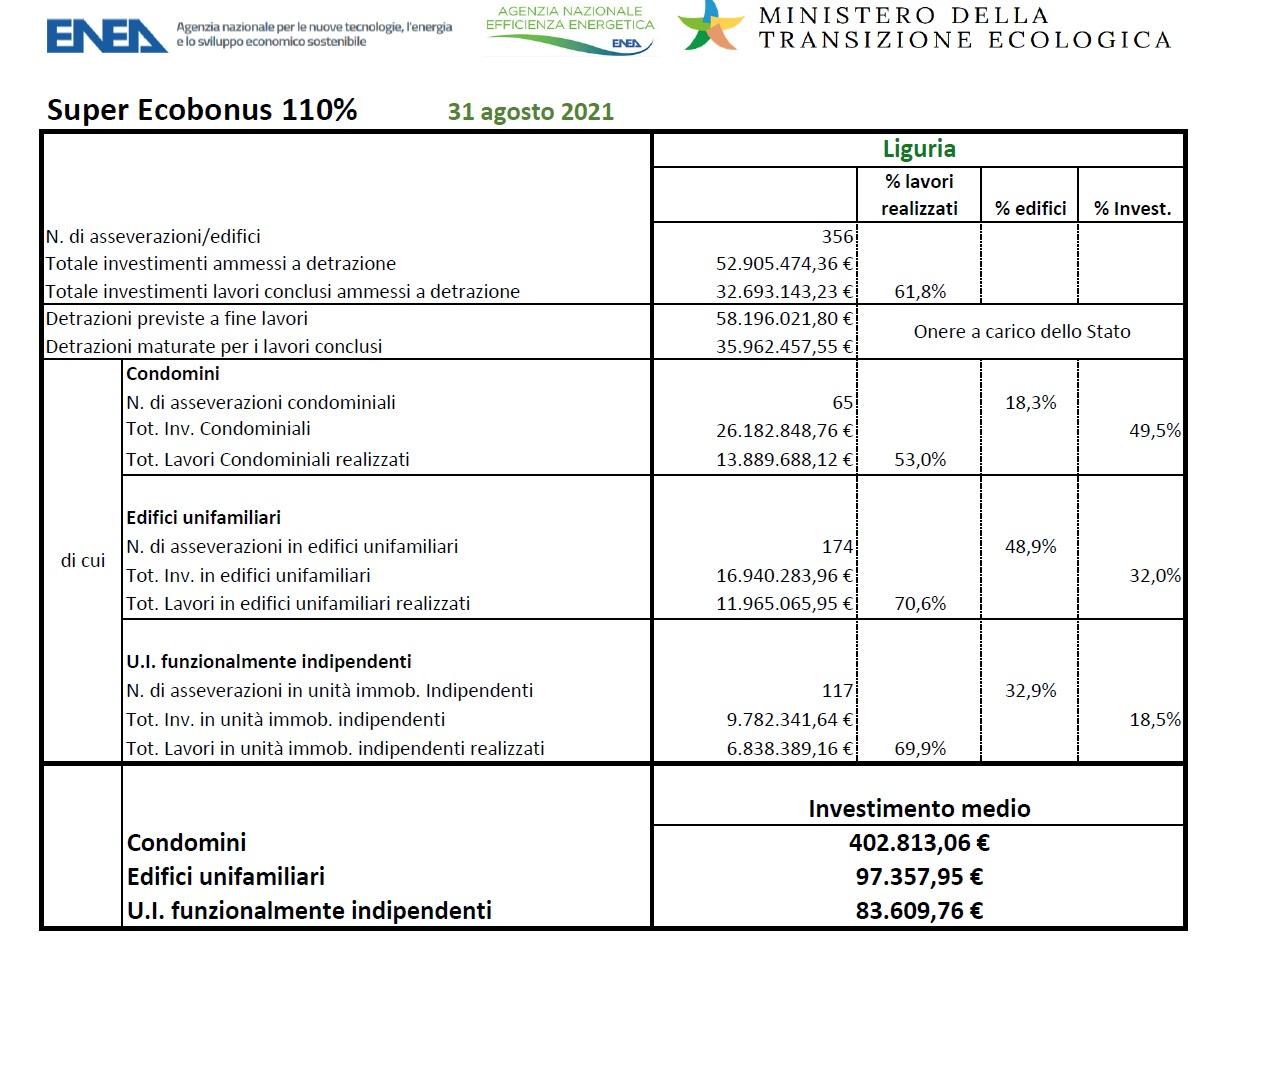 liguria Superbonus dati APE Confedilizia Genova